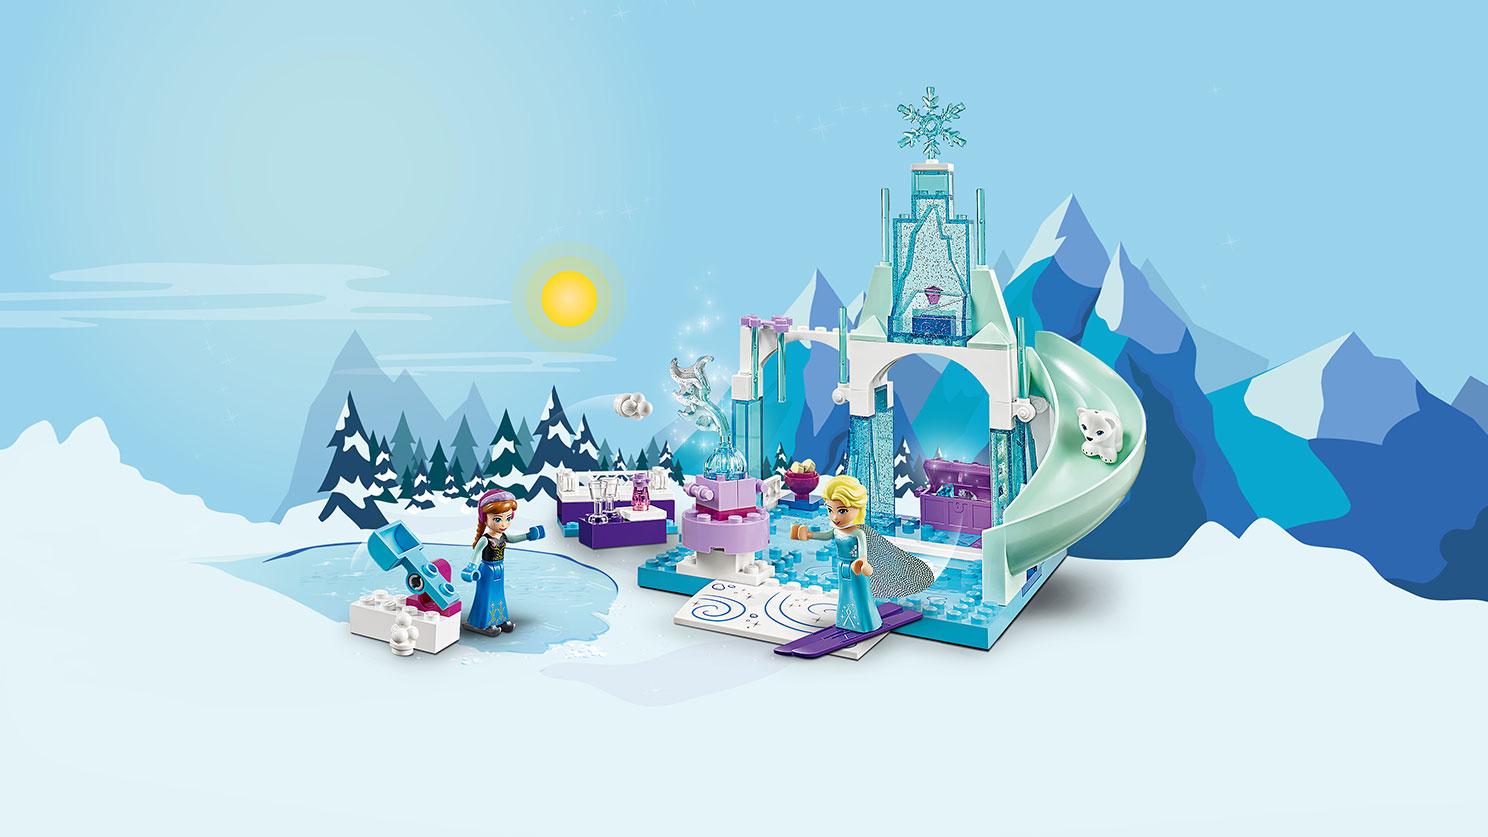 10736 L'aire de jeu d'Anna et Elsa